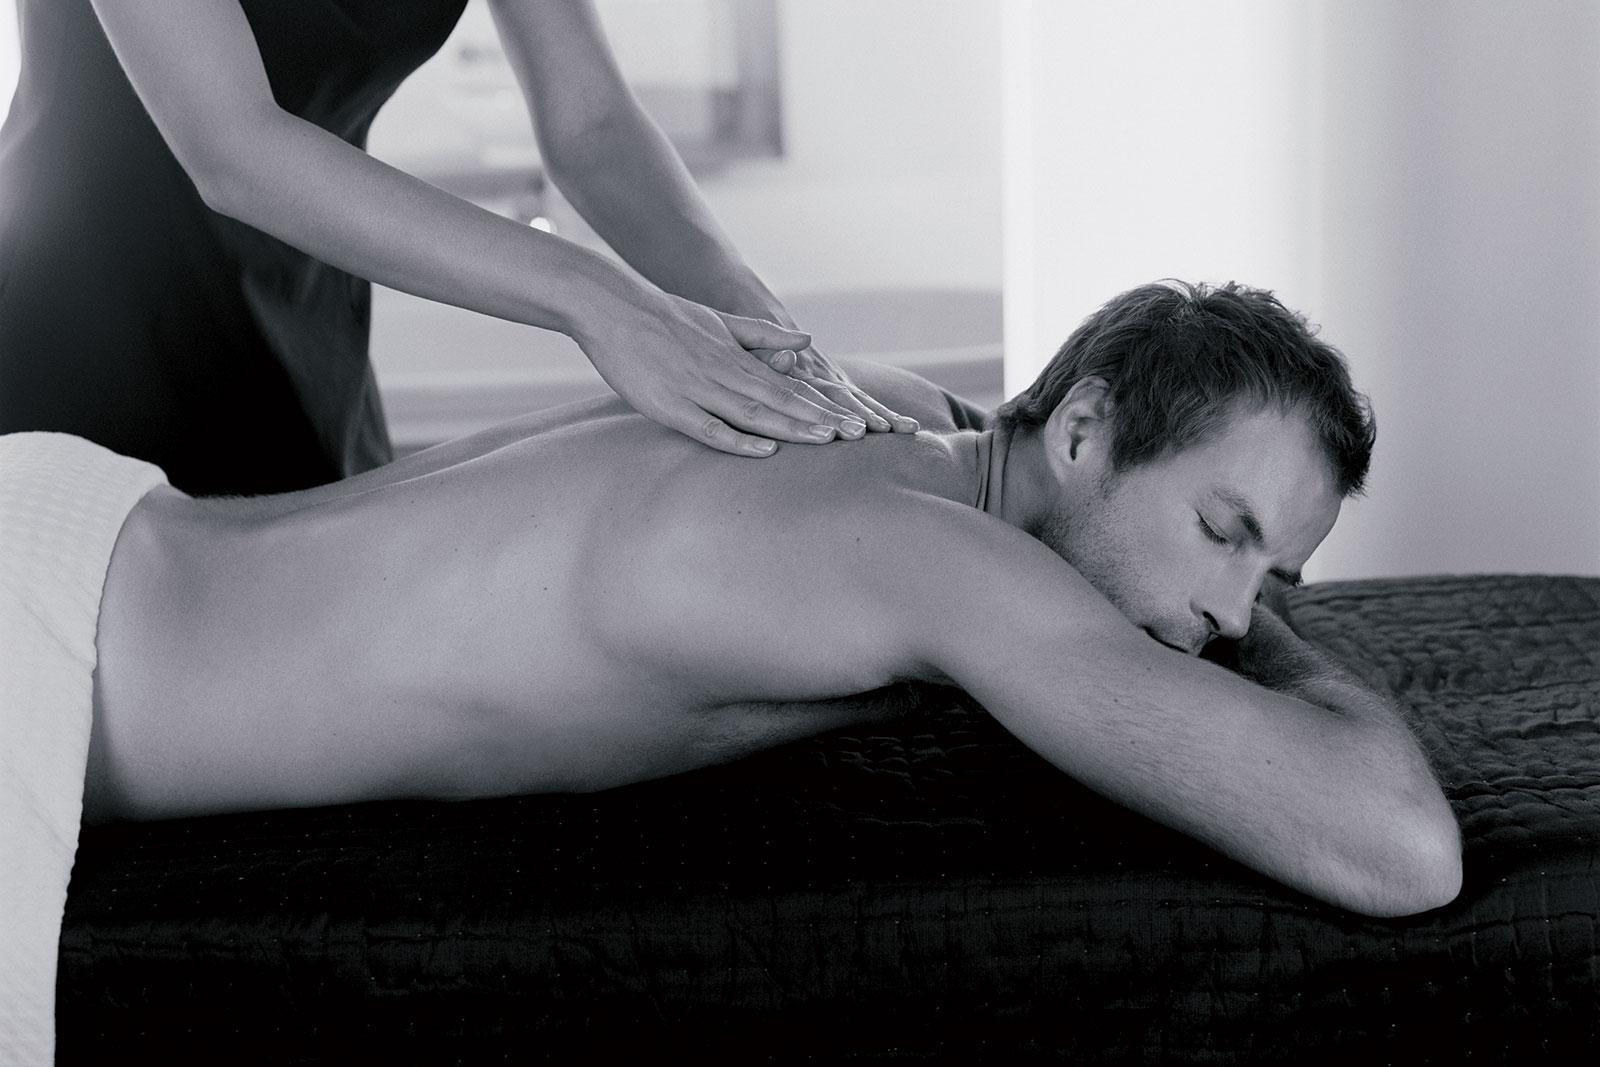 BnW-Male-Massage-2-copy